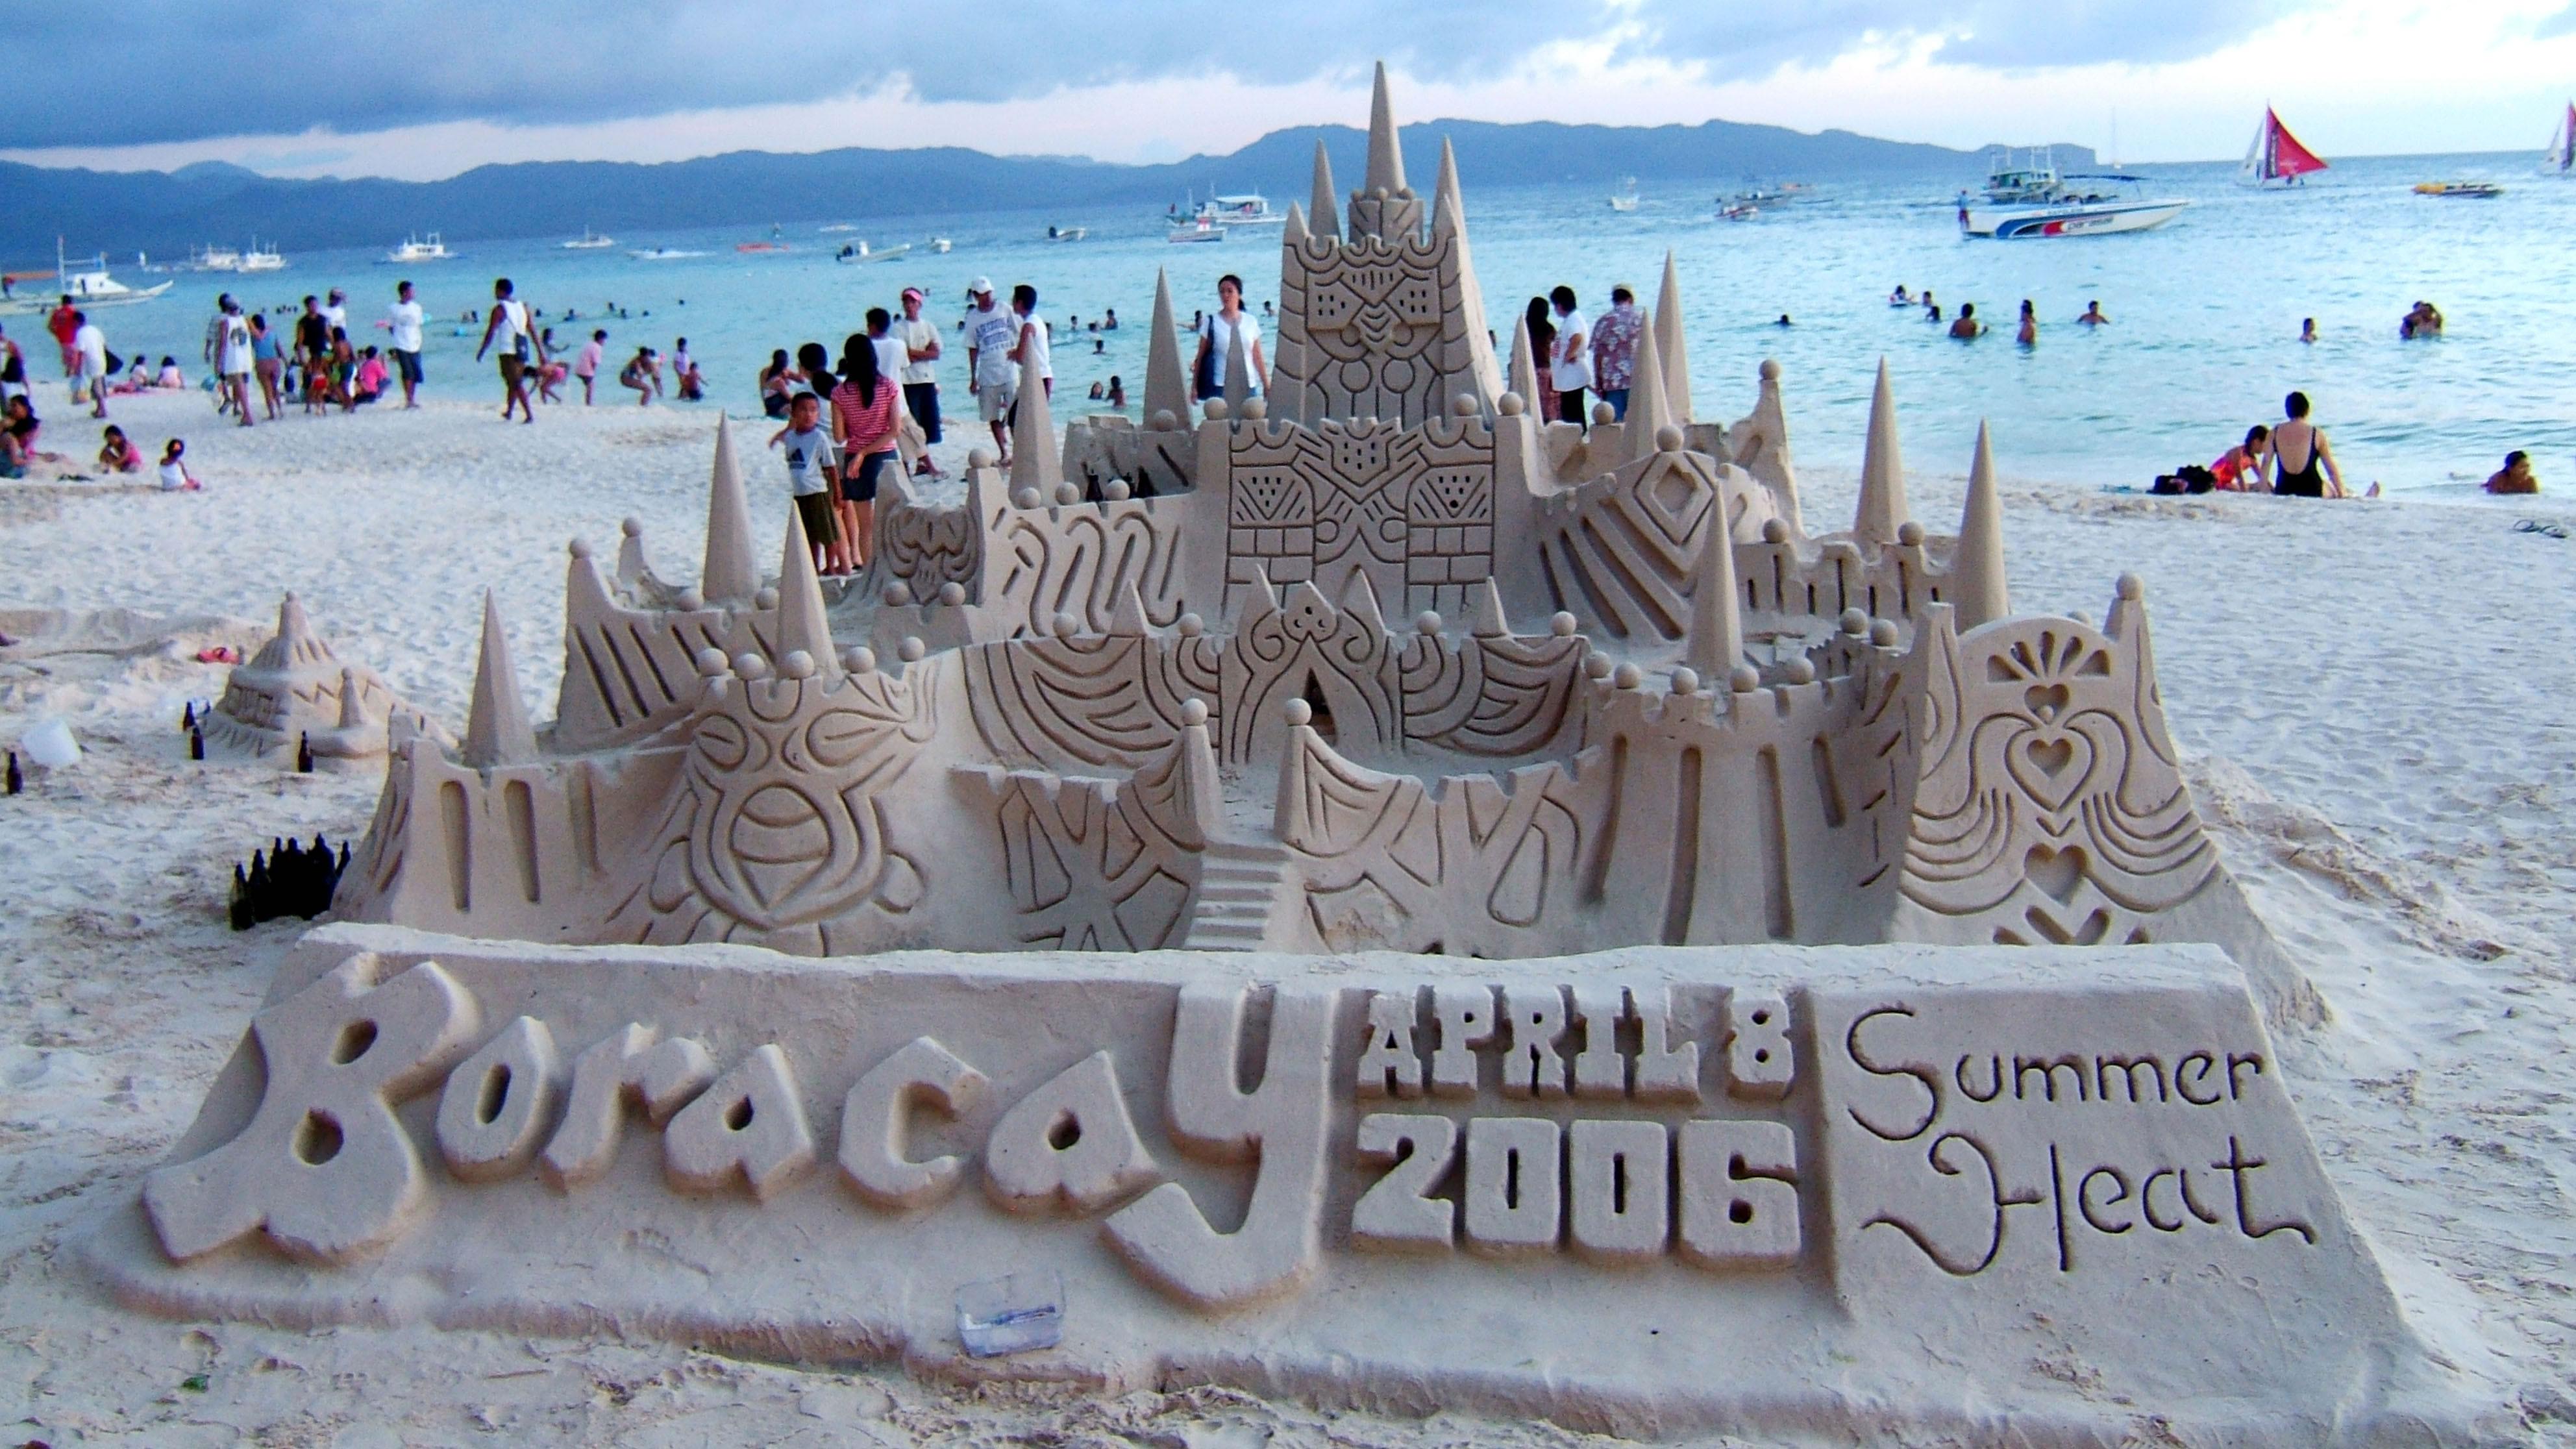 Philippines Sugar Islands Caticlan Boracay White Beach Sand Castles 2006 02